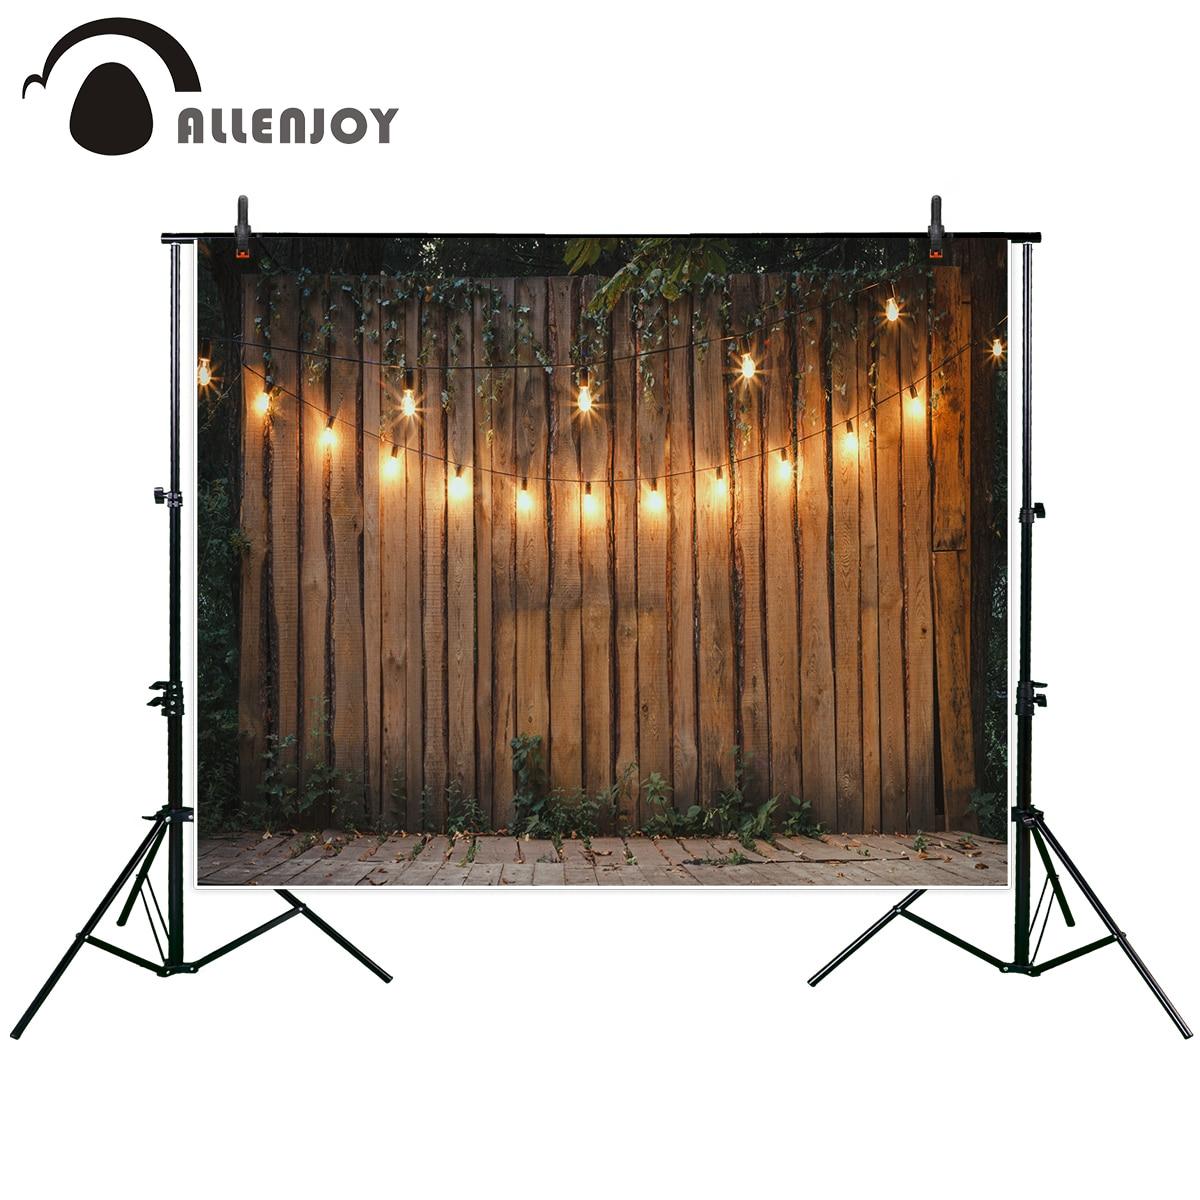 Allenjoy photography backdrop Wooden background lighting garland festive strings round lamps background new original design